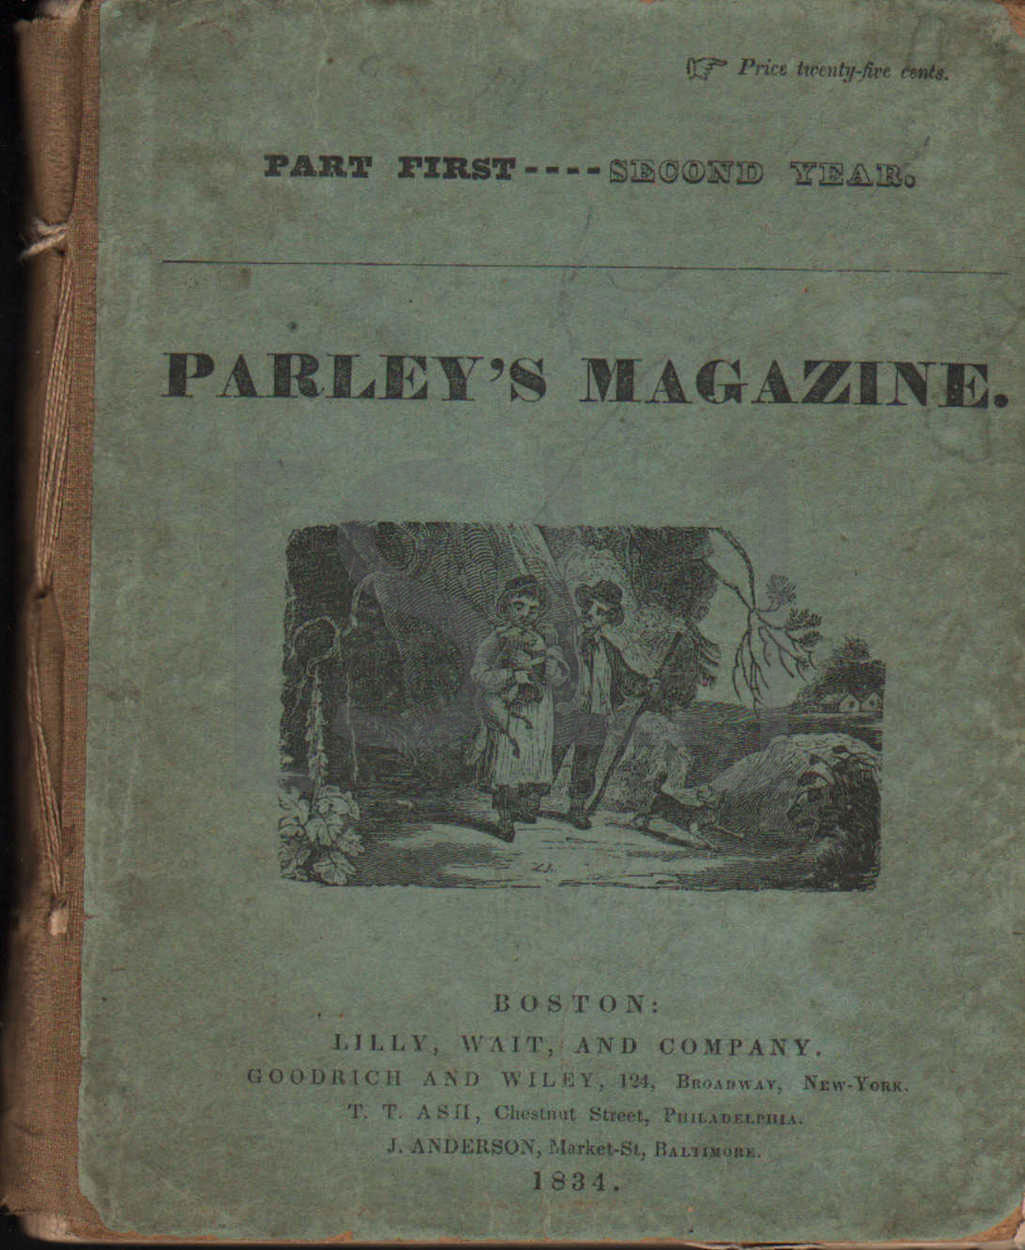 Parley's Magazine